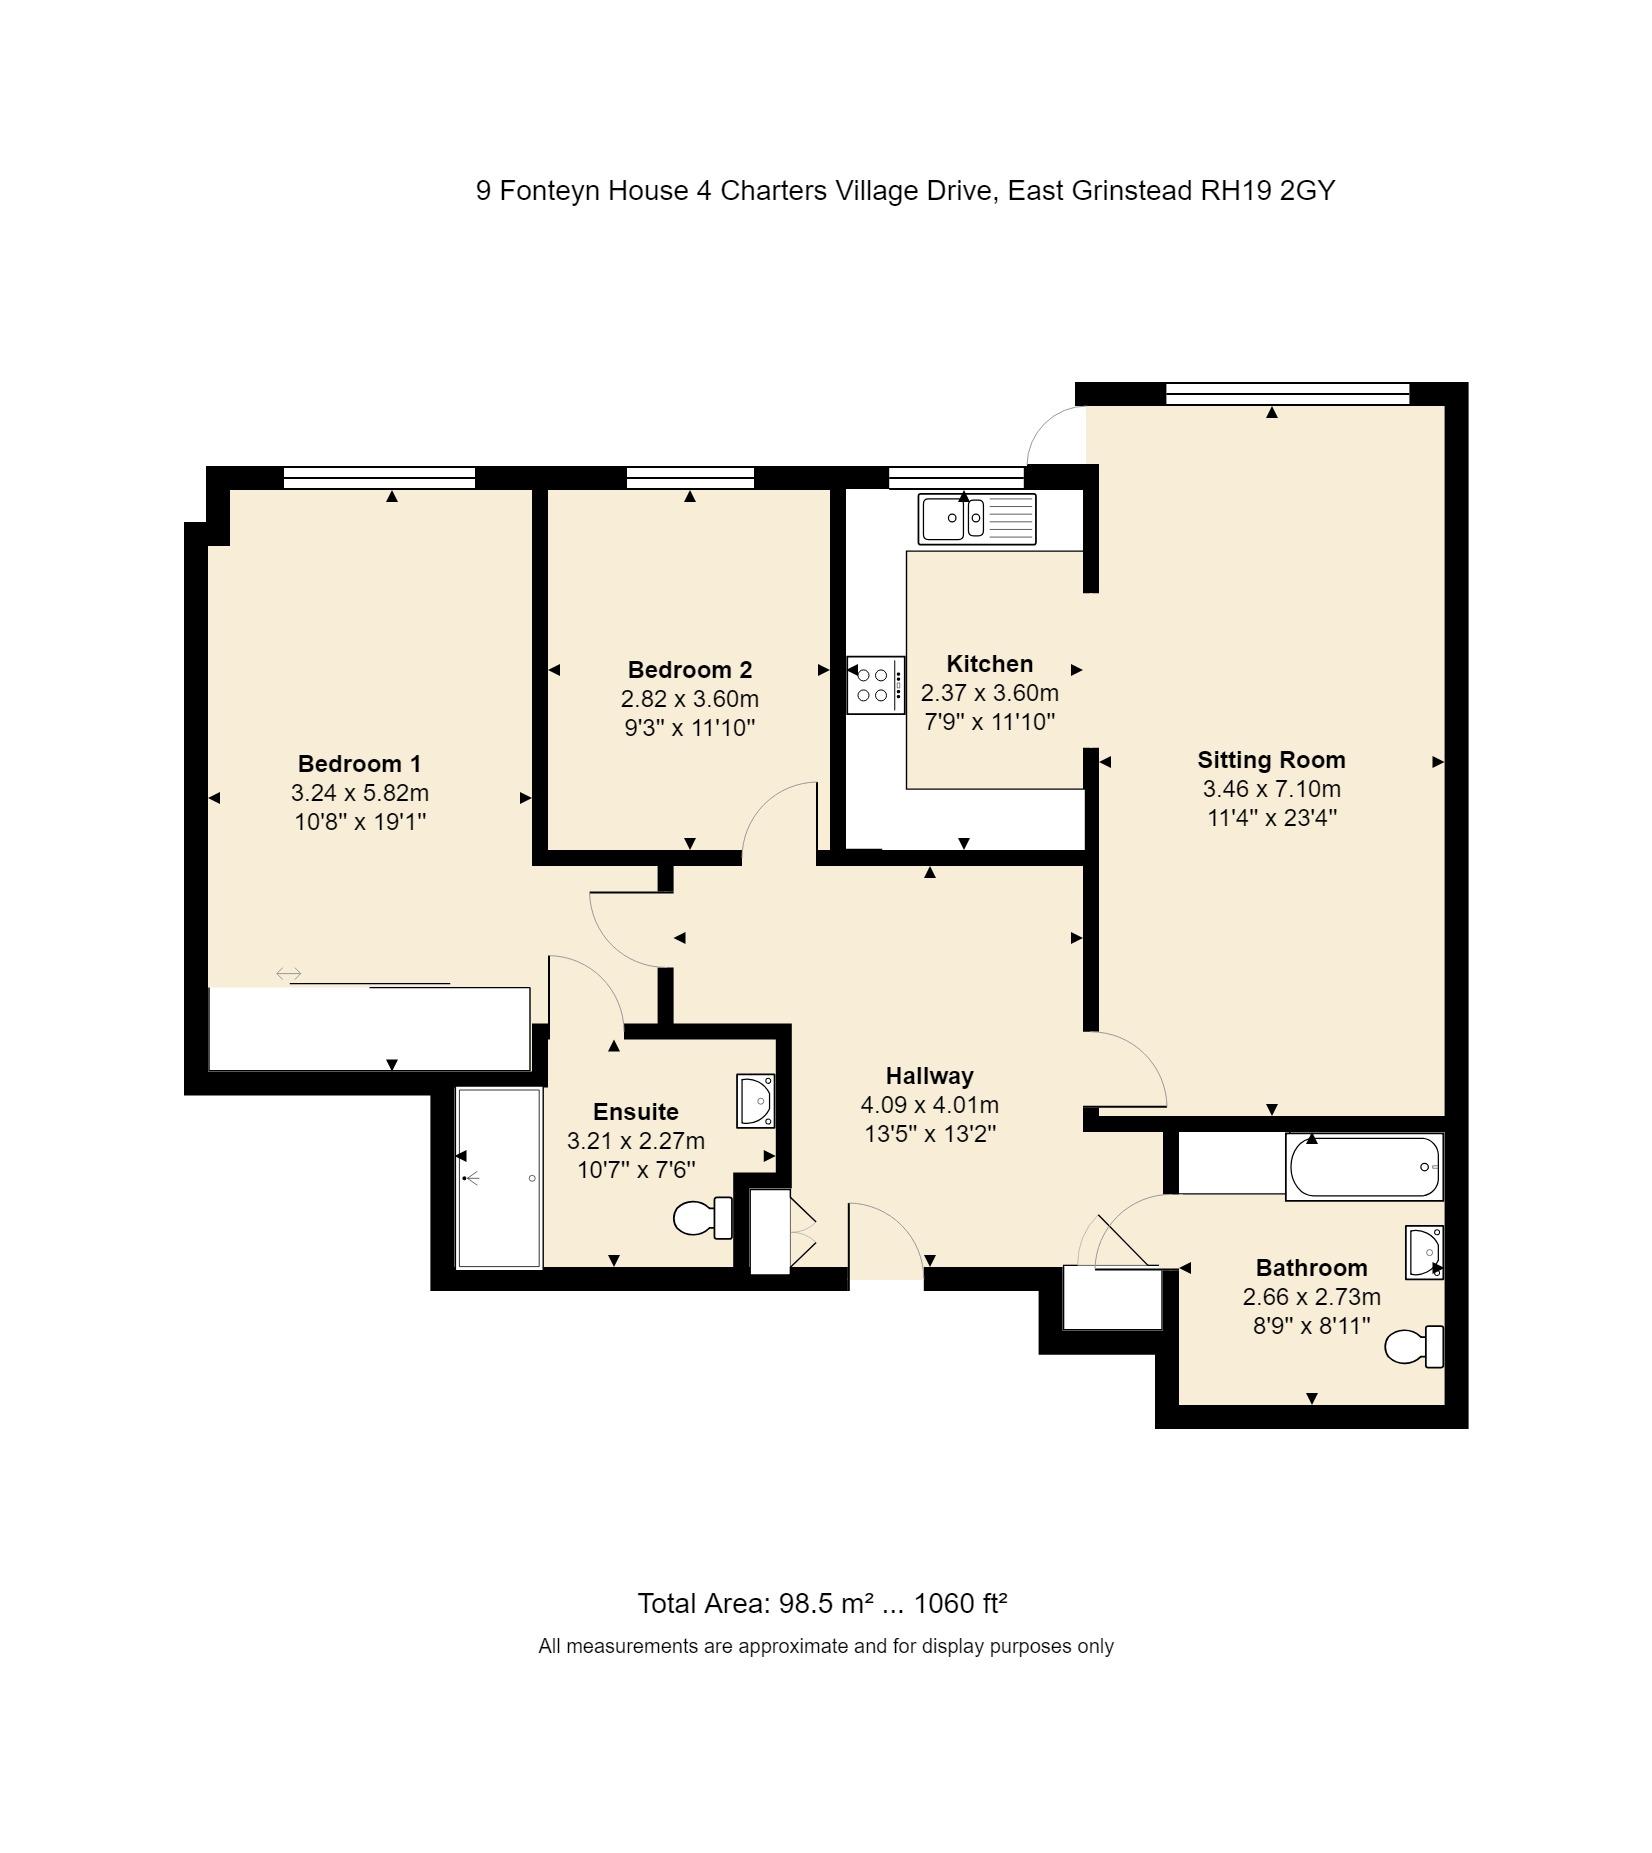 9 Fonteyn House Floorplan